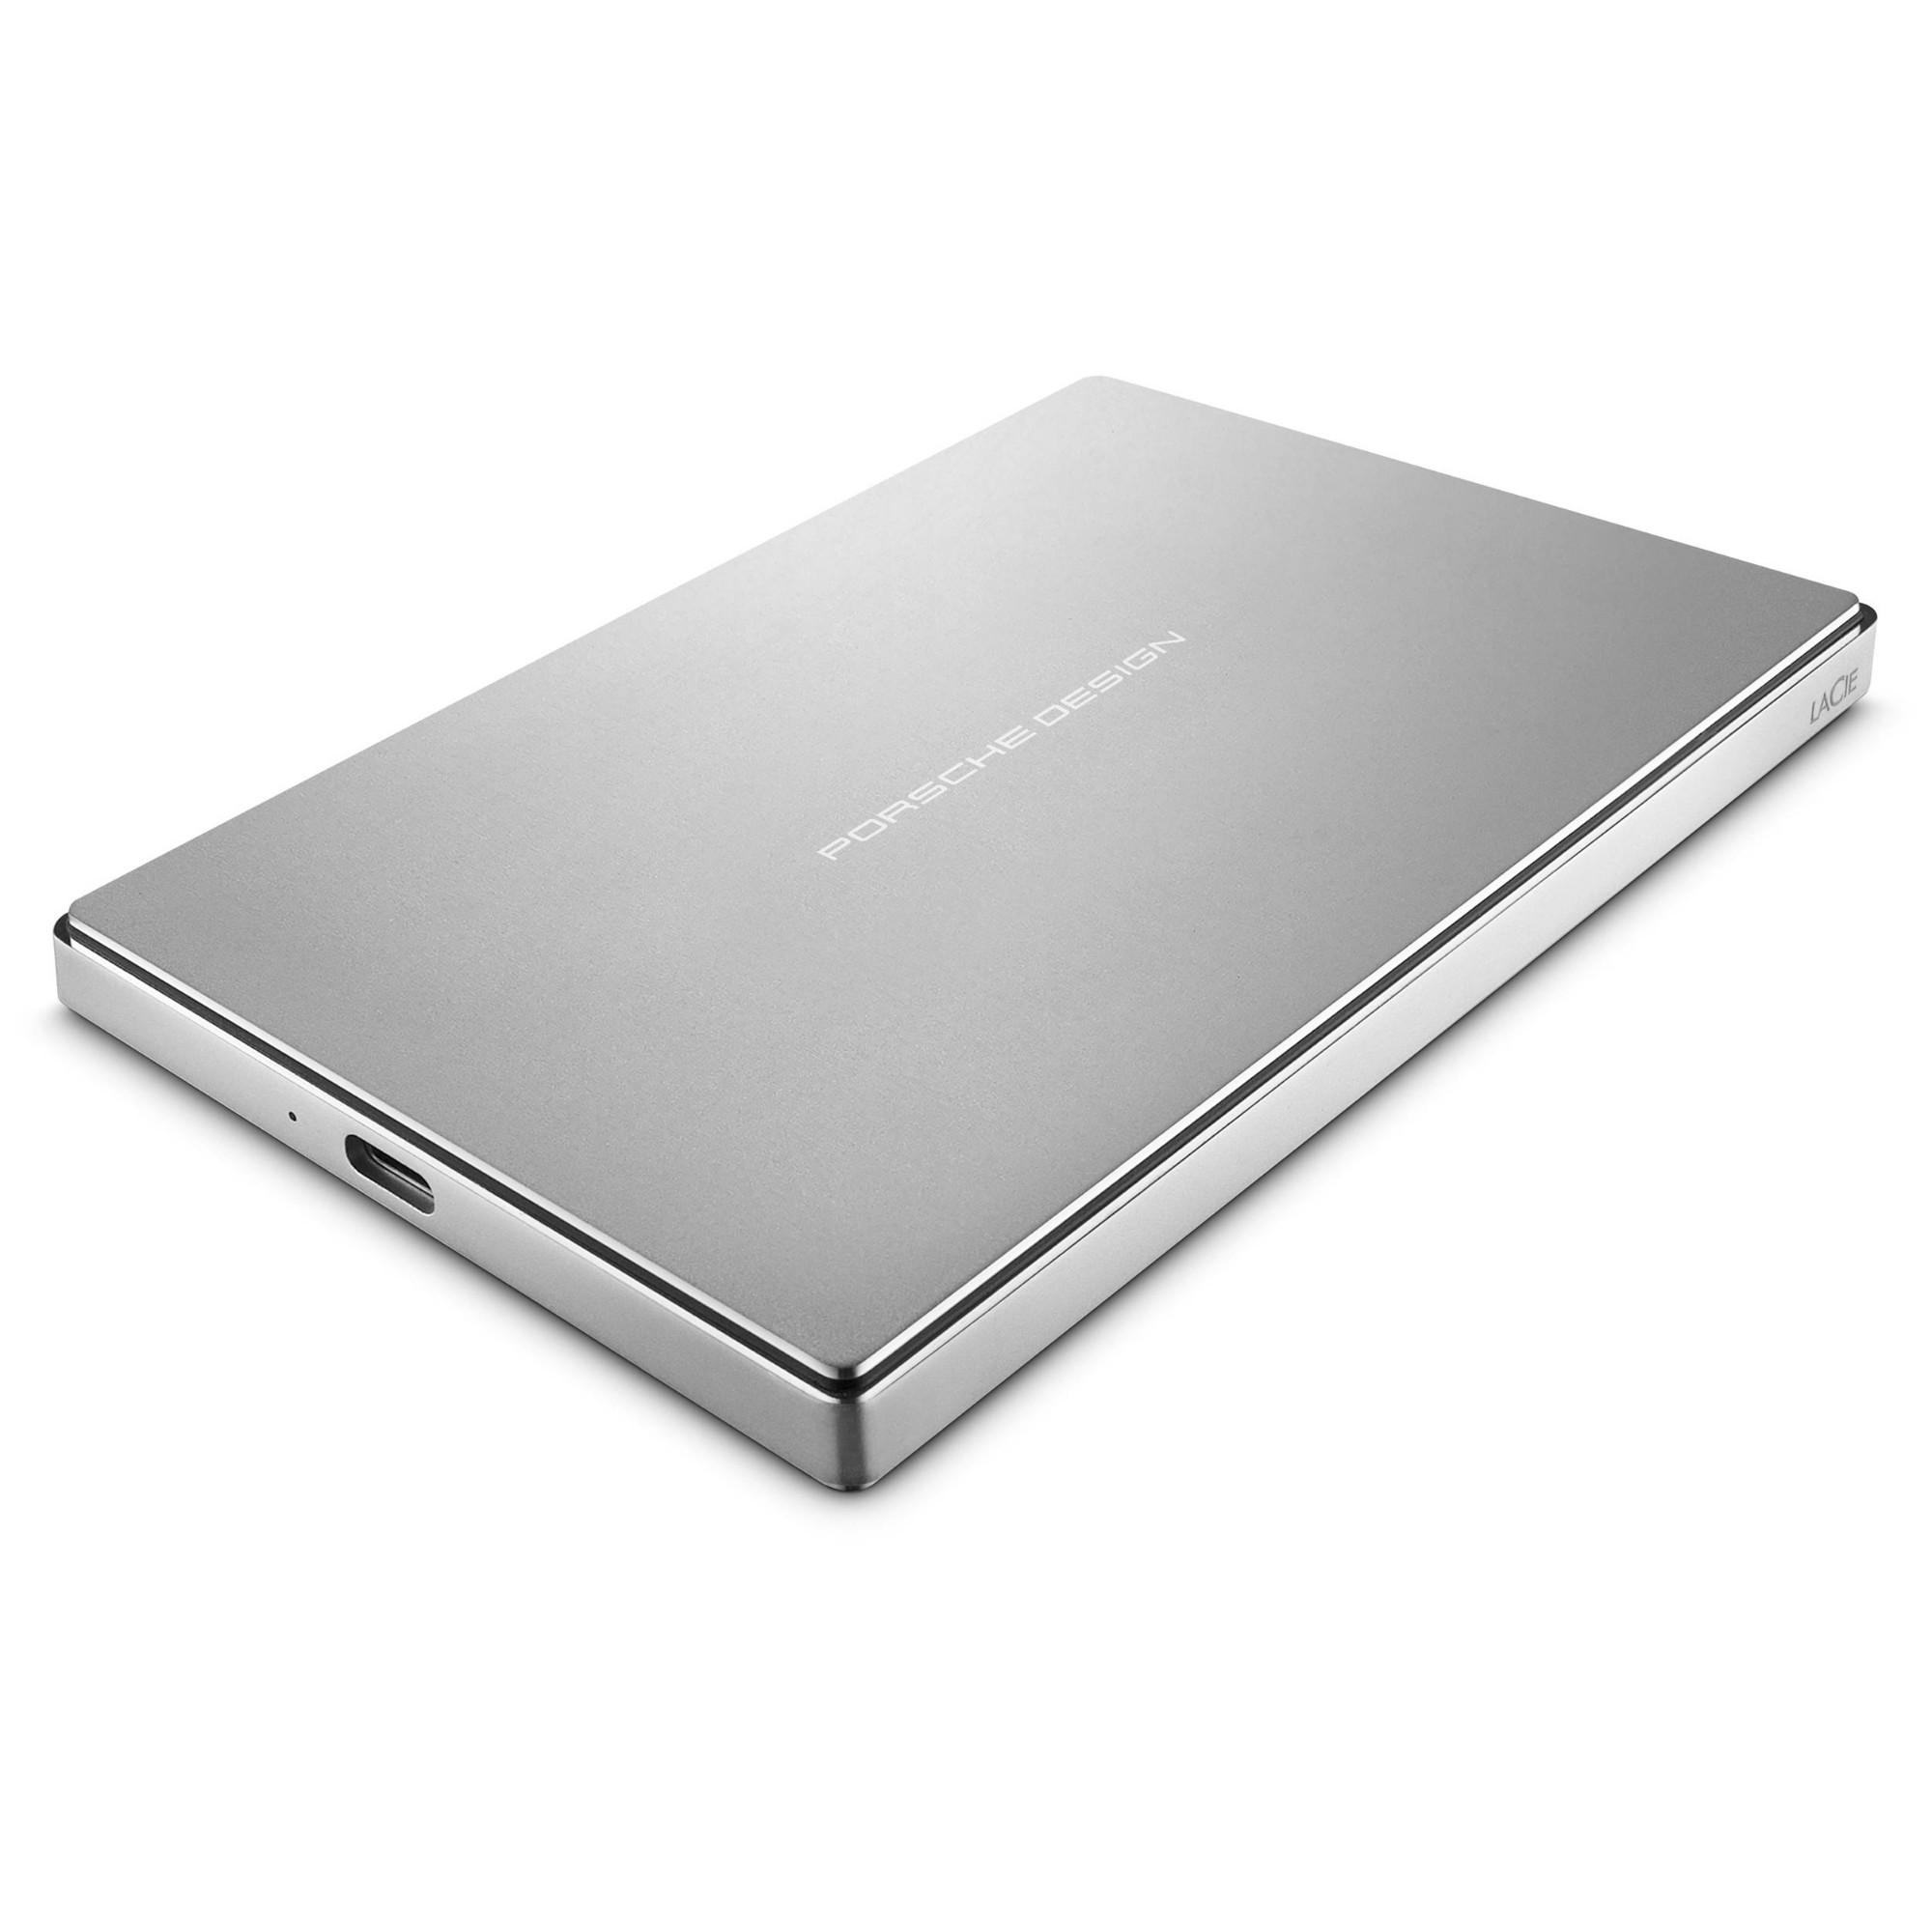 LaCie Porsche Design Mobile external hard drive 1000 GB Silver